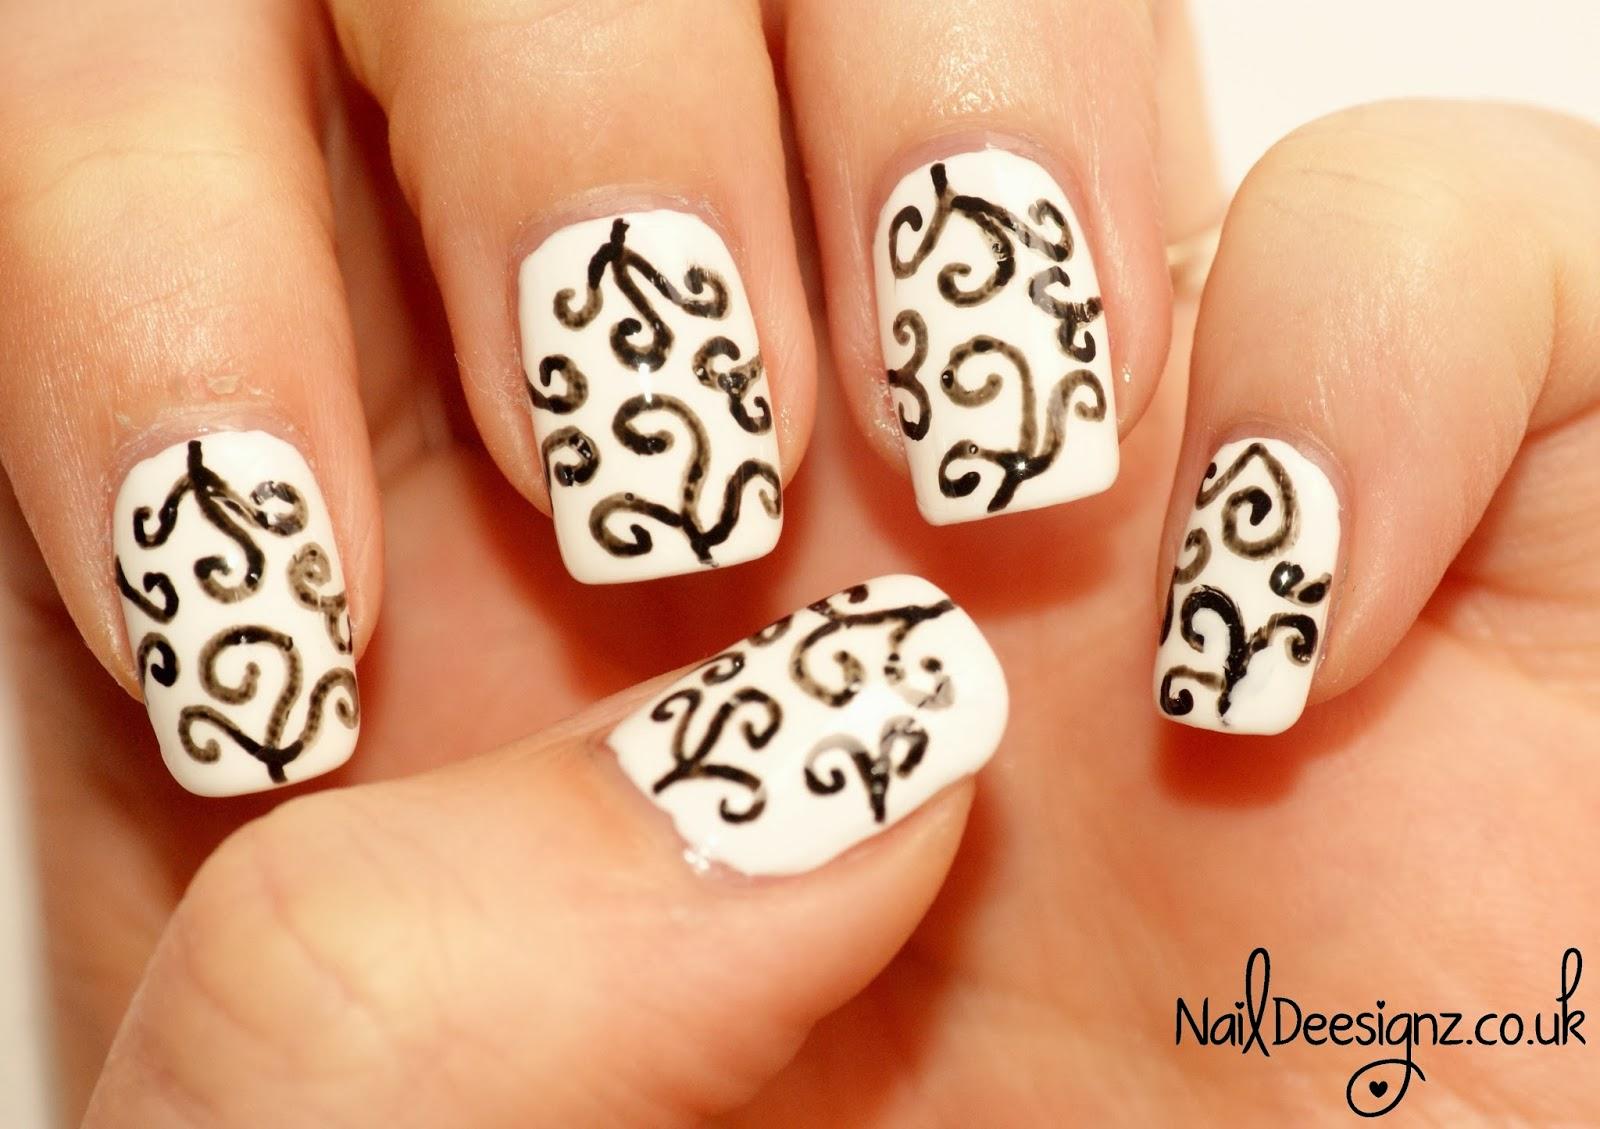 NailDeesignz: Black & White Swirls Nail Art